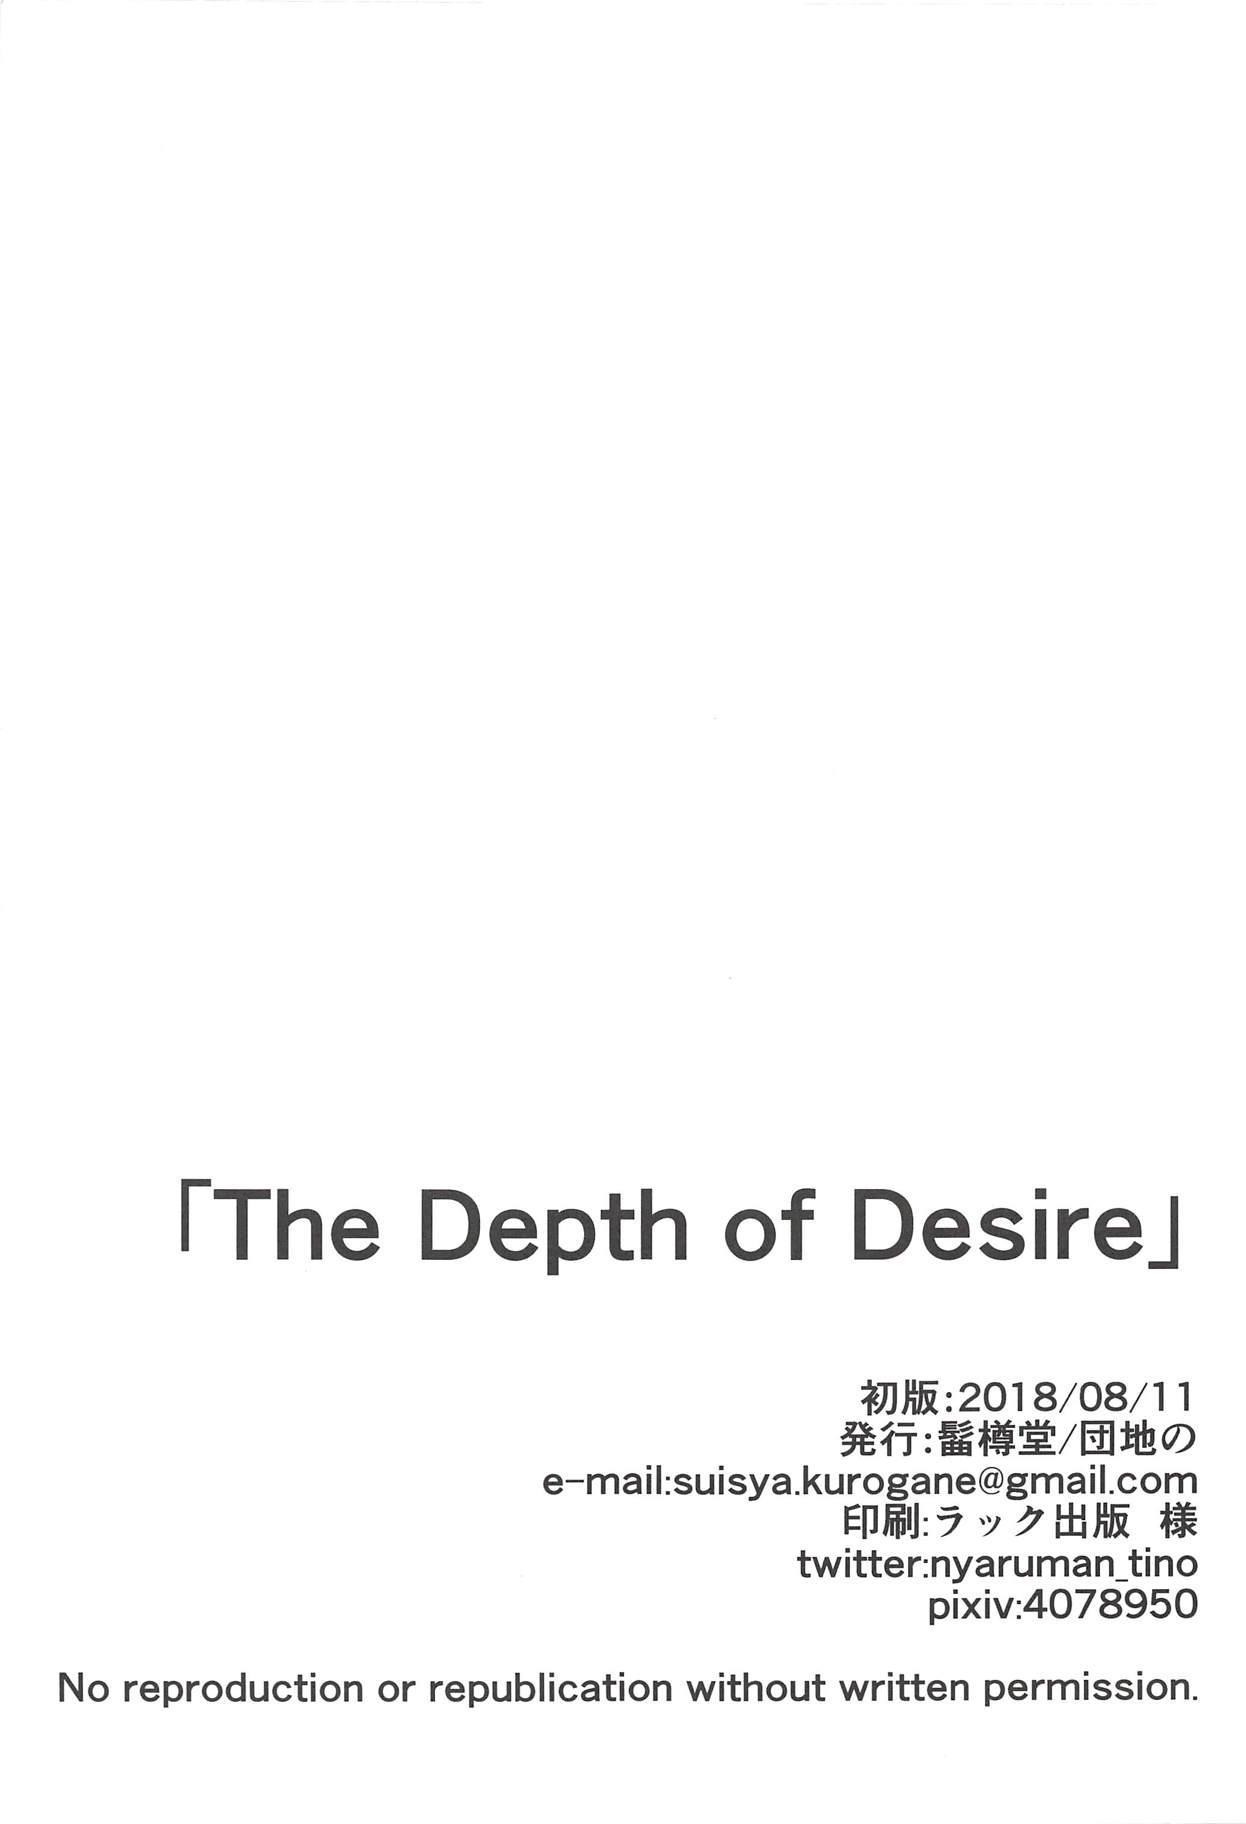 The Depth of Desire 23